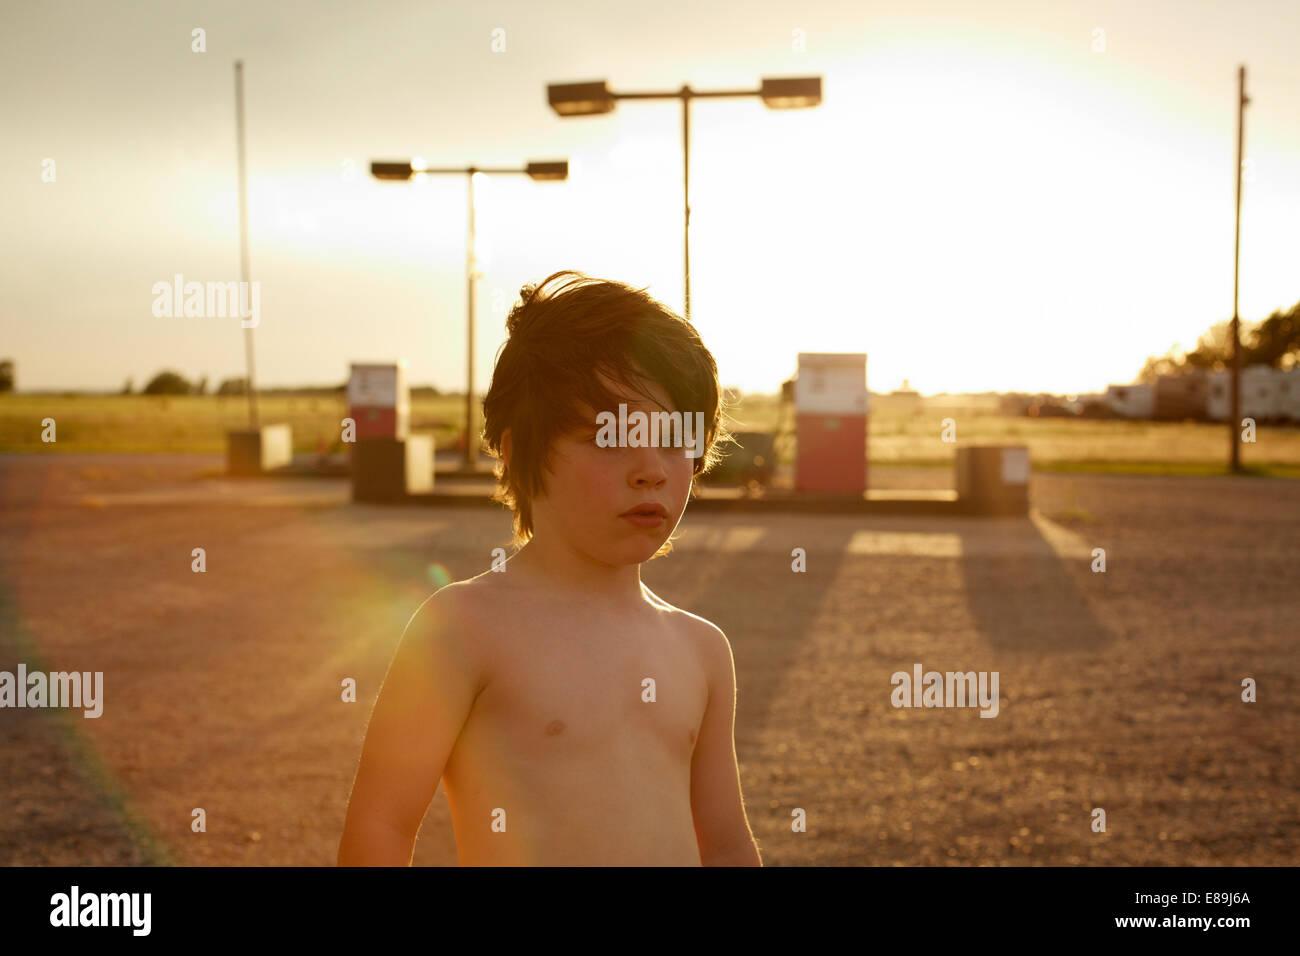 Shirtless boy at gas station Photo Stock